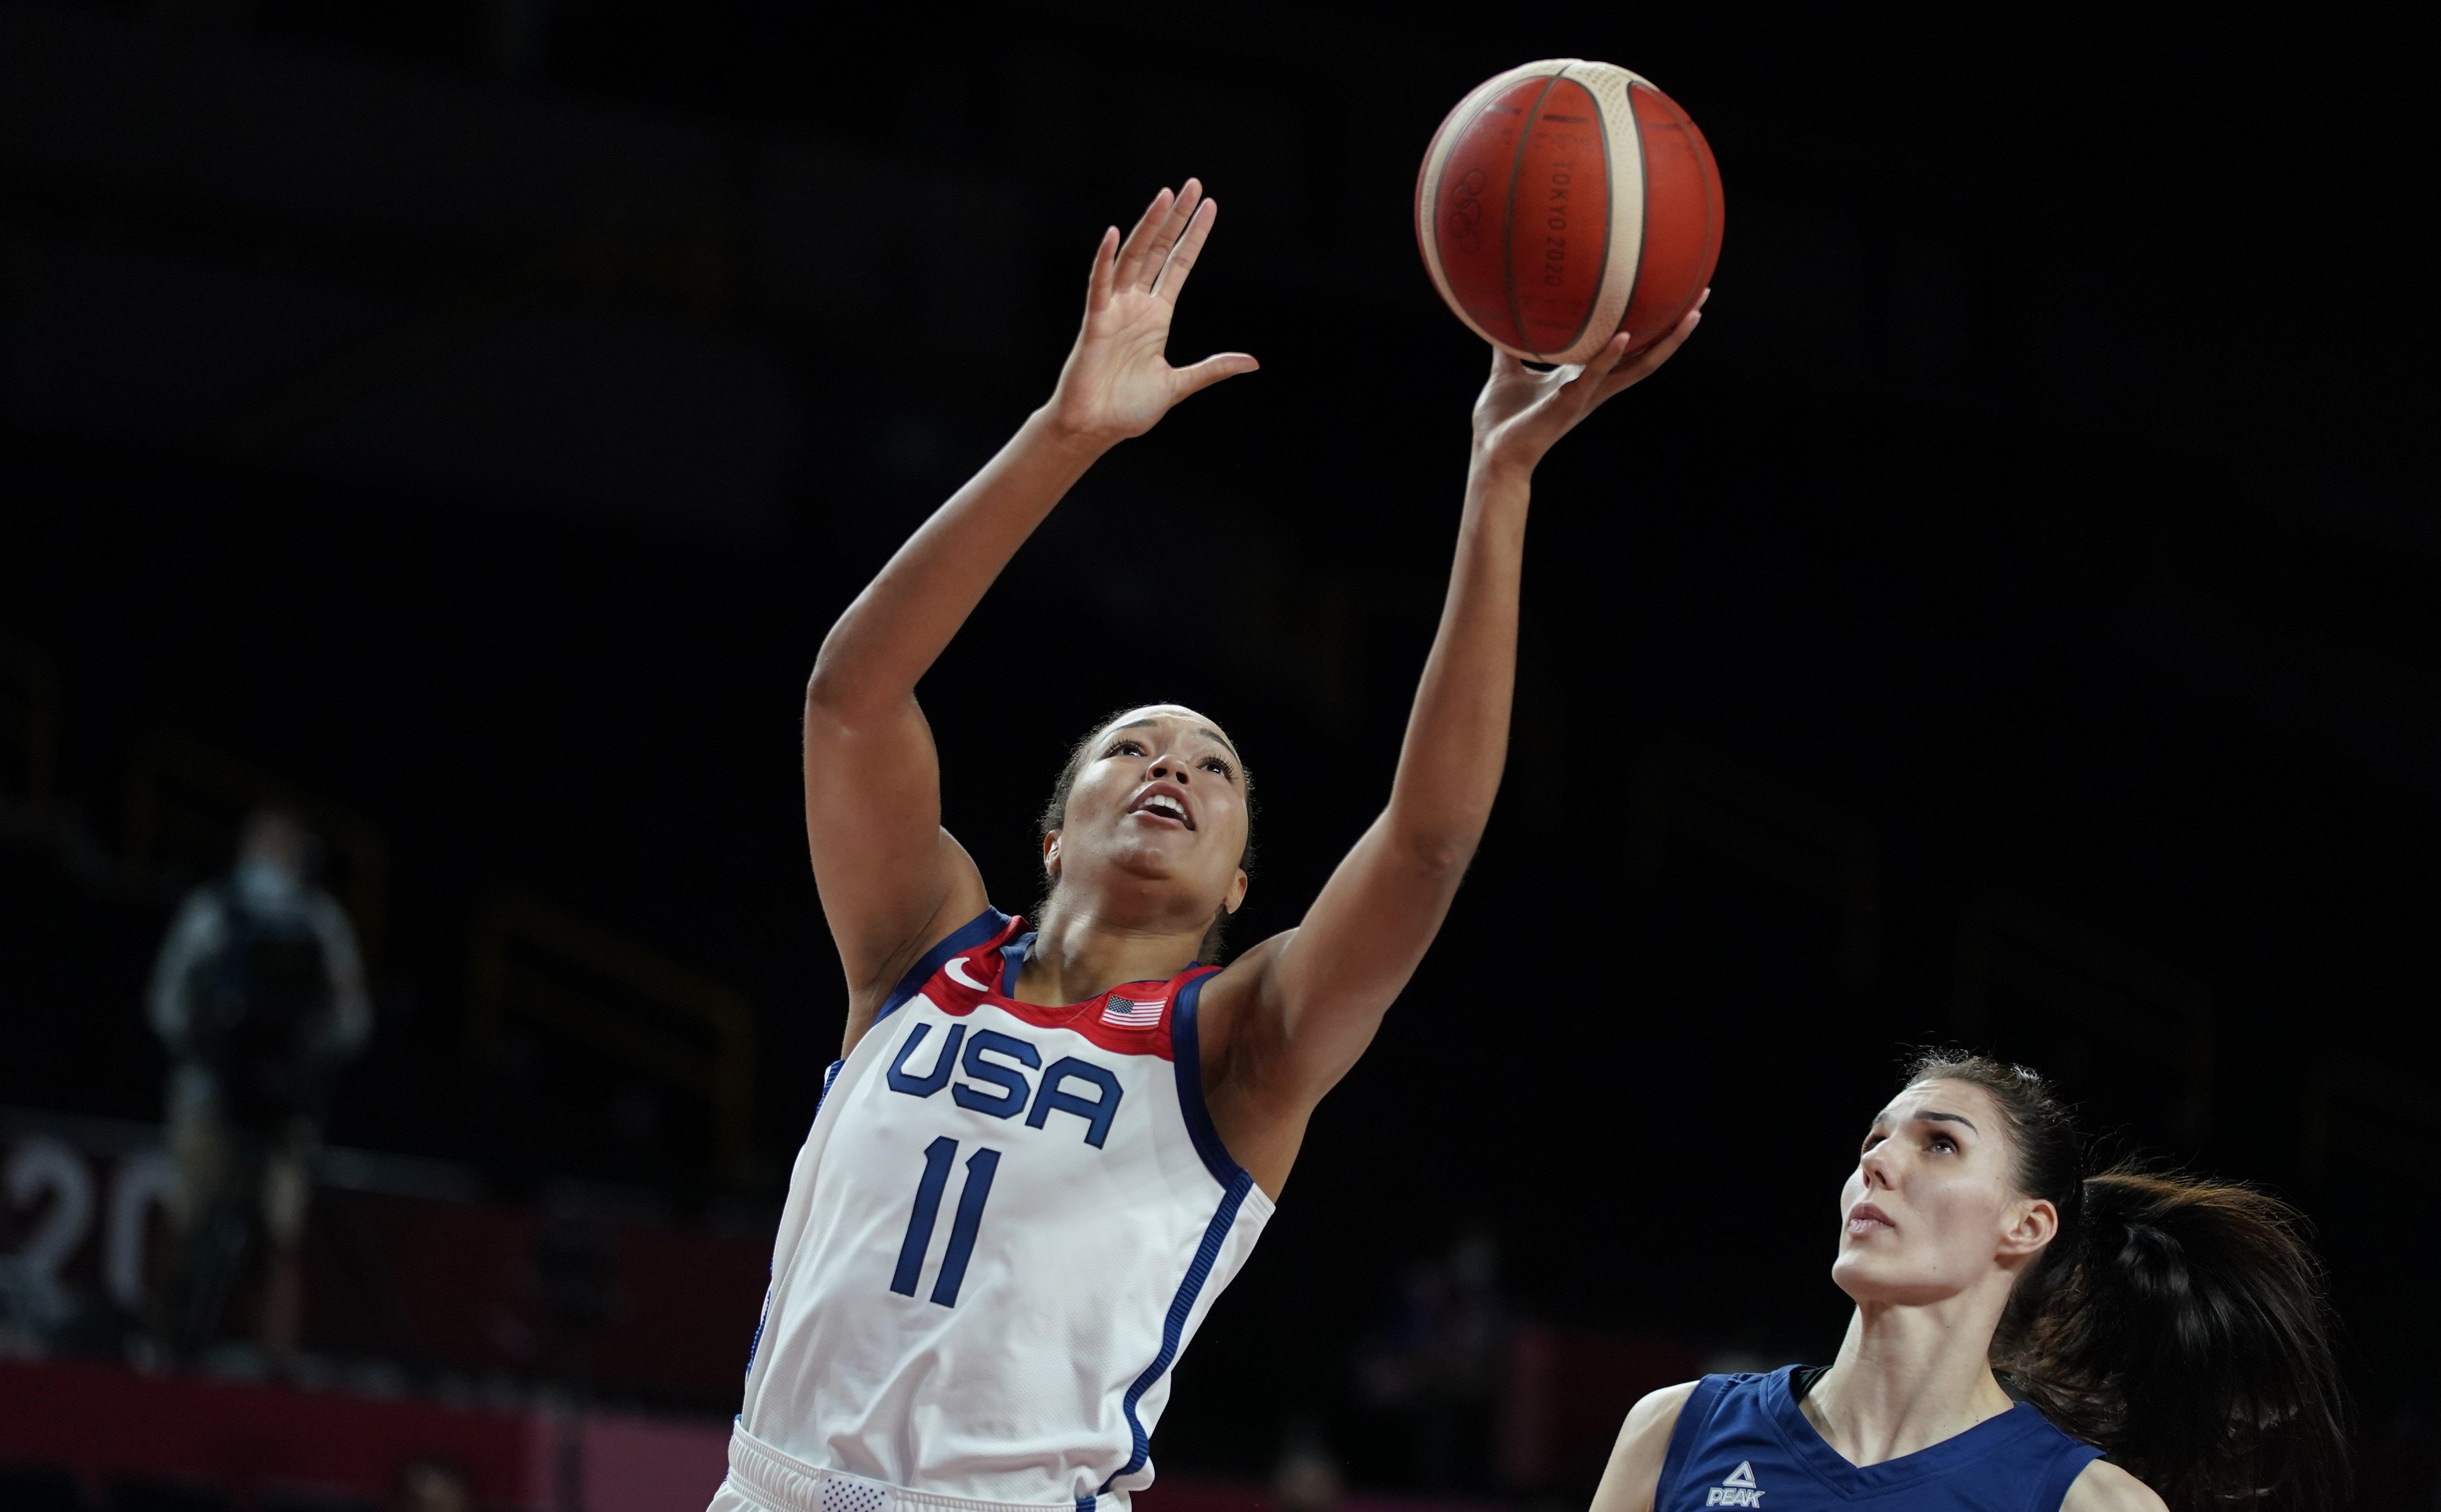 U.S. women's basketball team shuts down Serbia, advances to gold medal game